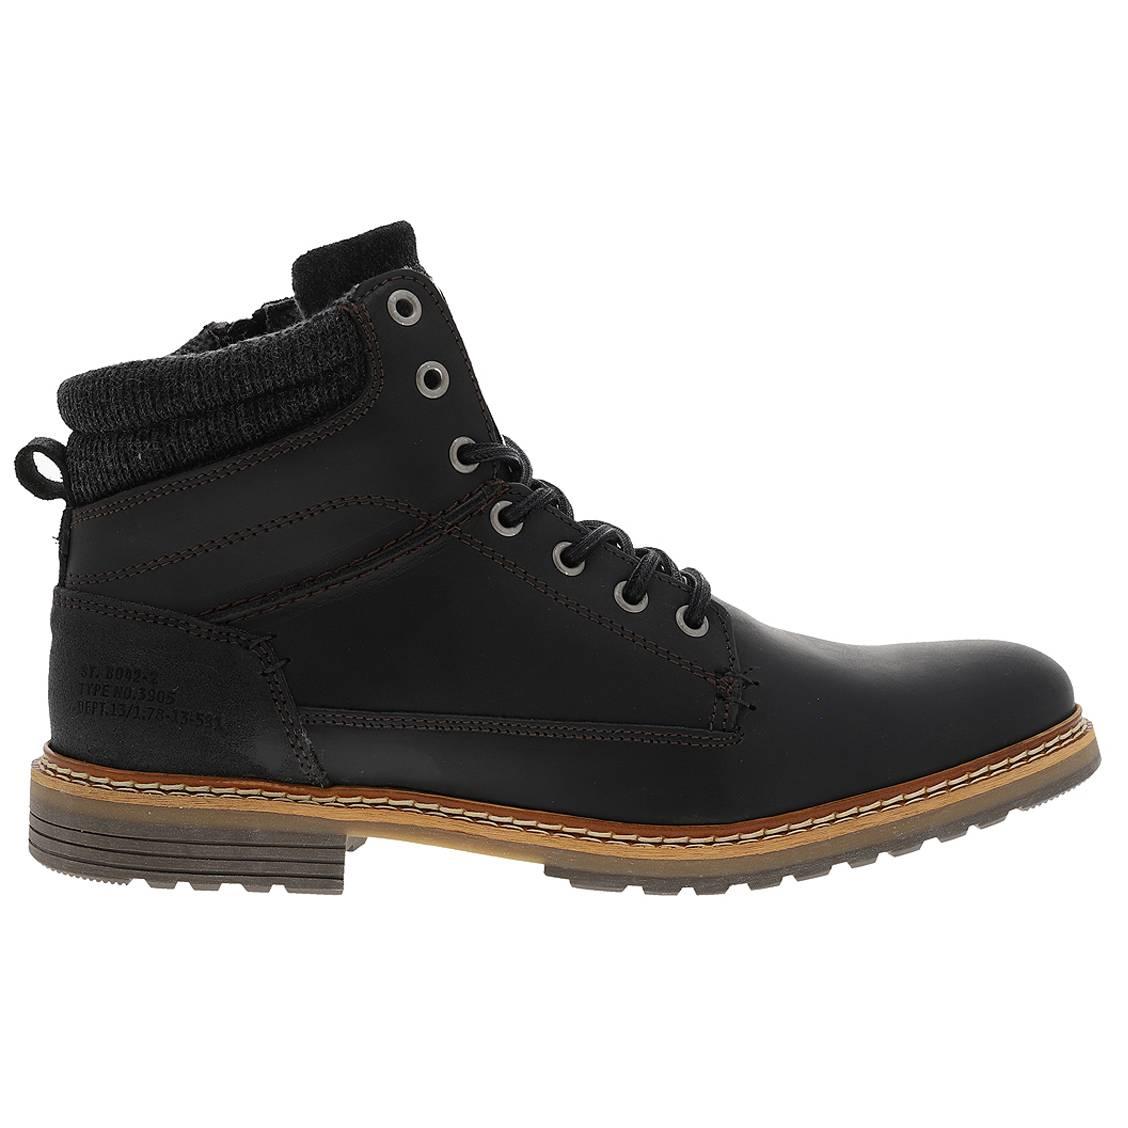 Chaussures Bullboxer montantes en cuir noir. Chaussures Bullboxer montantes en cuir noir